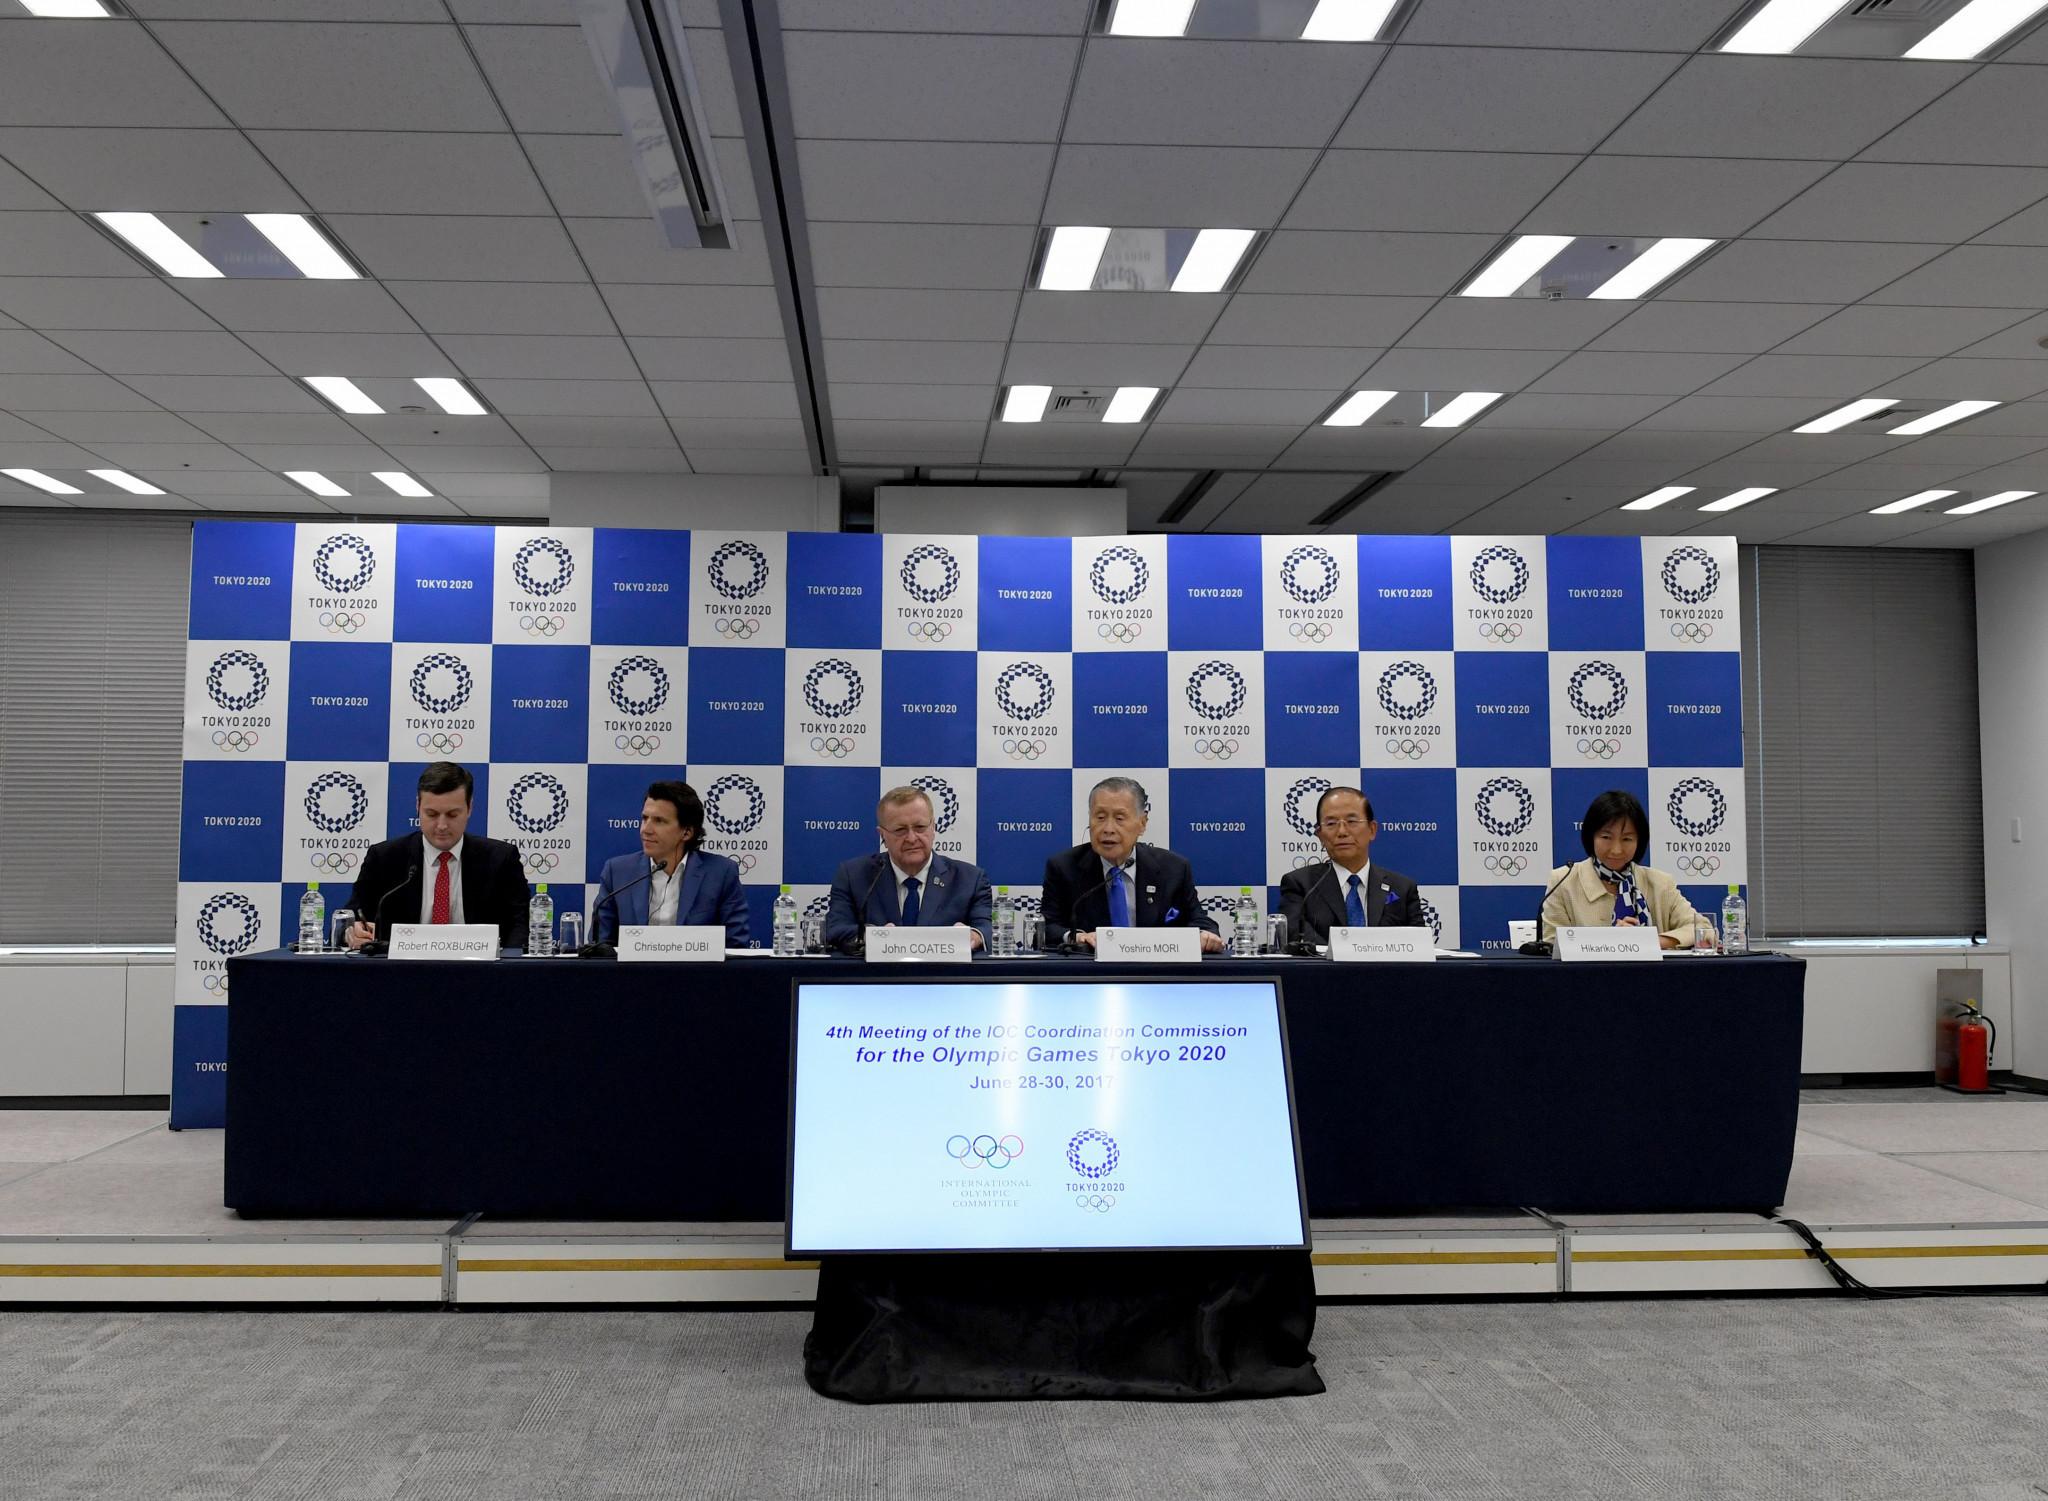 IOC Coordination Commission set to make return visit to Tokyo 2020